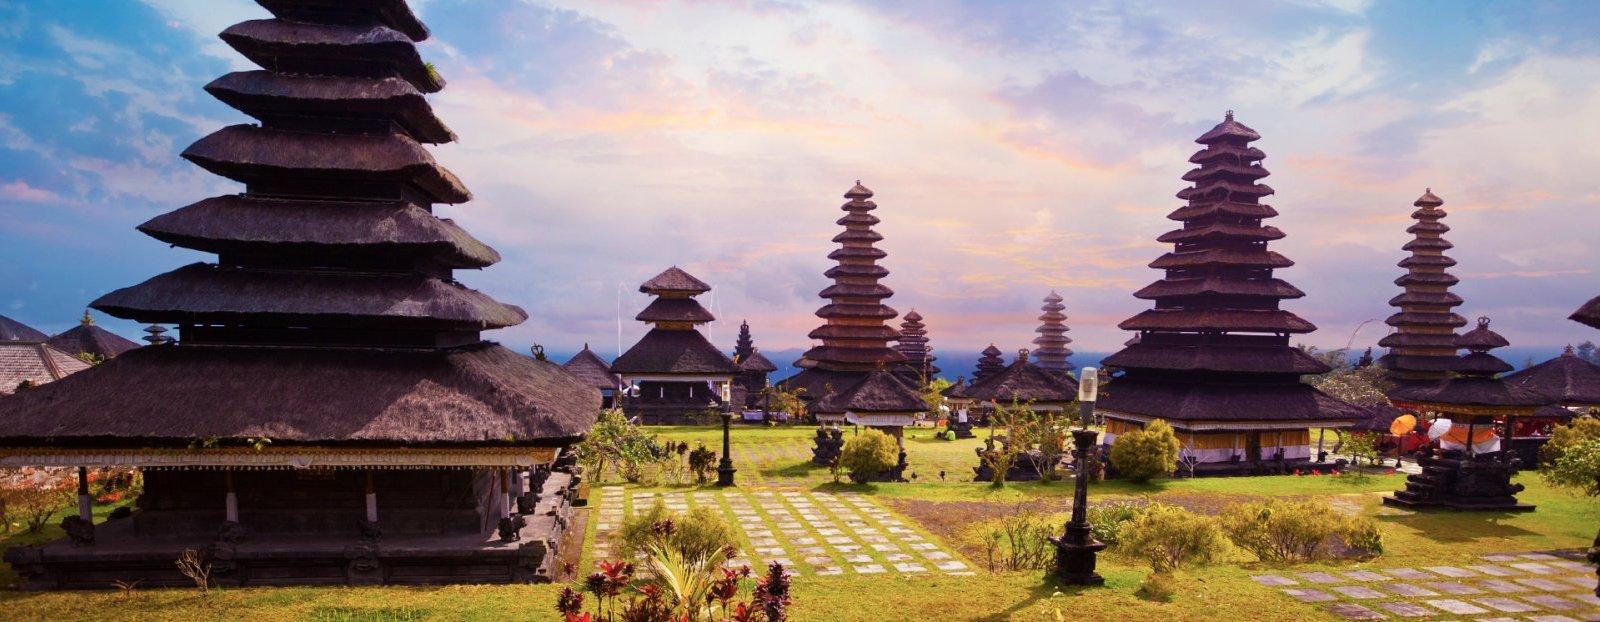 viajes combinados Bali e Islas Gili